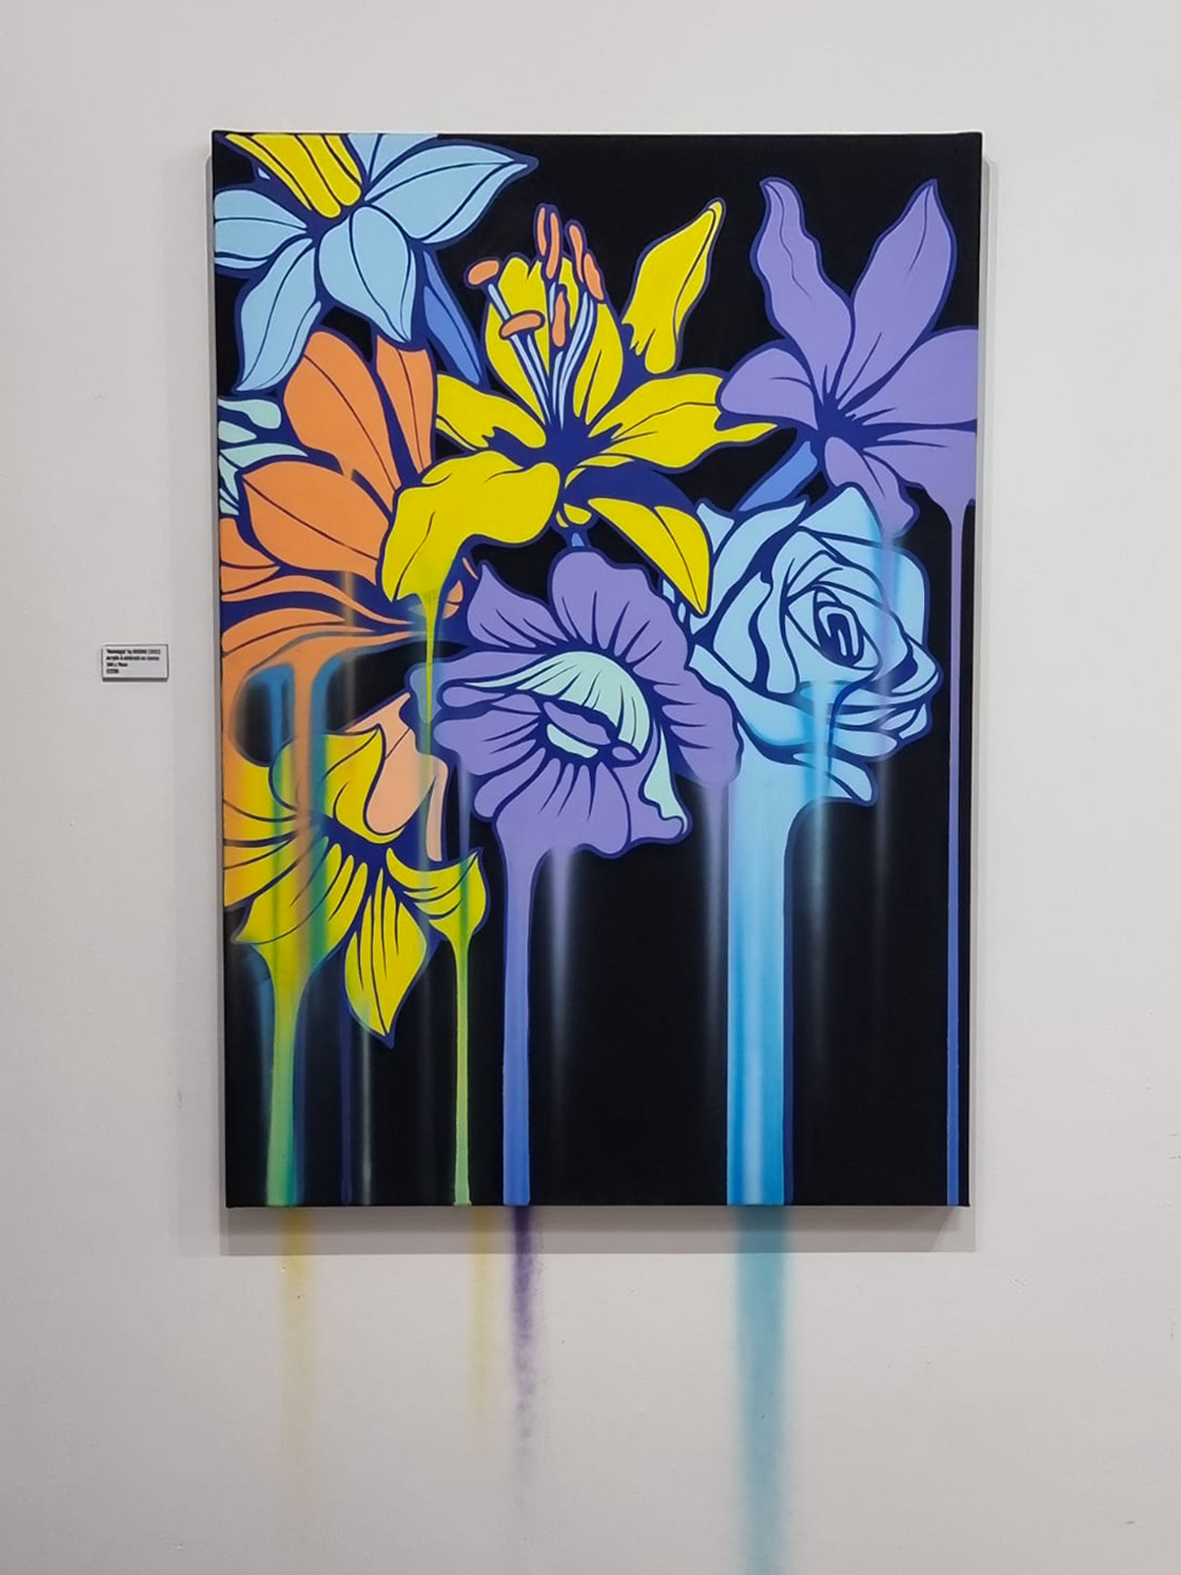 Nerone-futurstalgia-BSMT-gallery-1